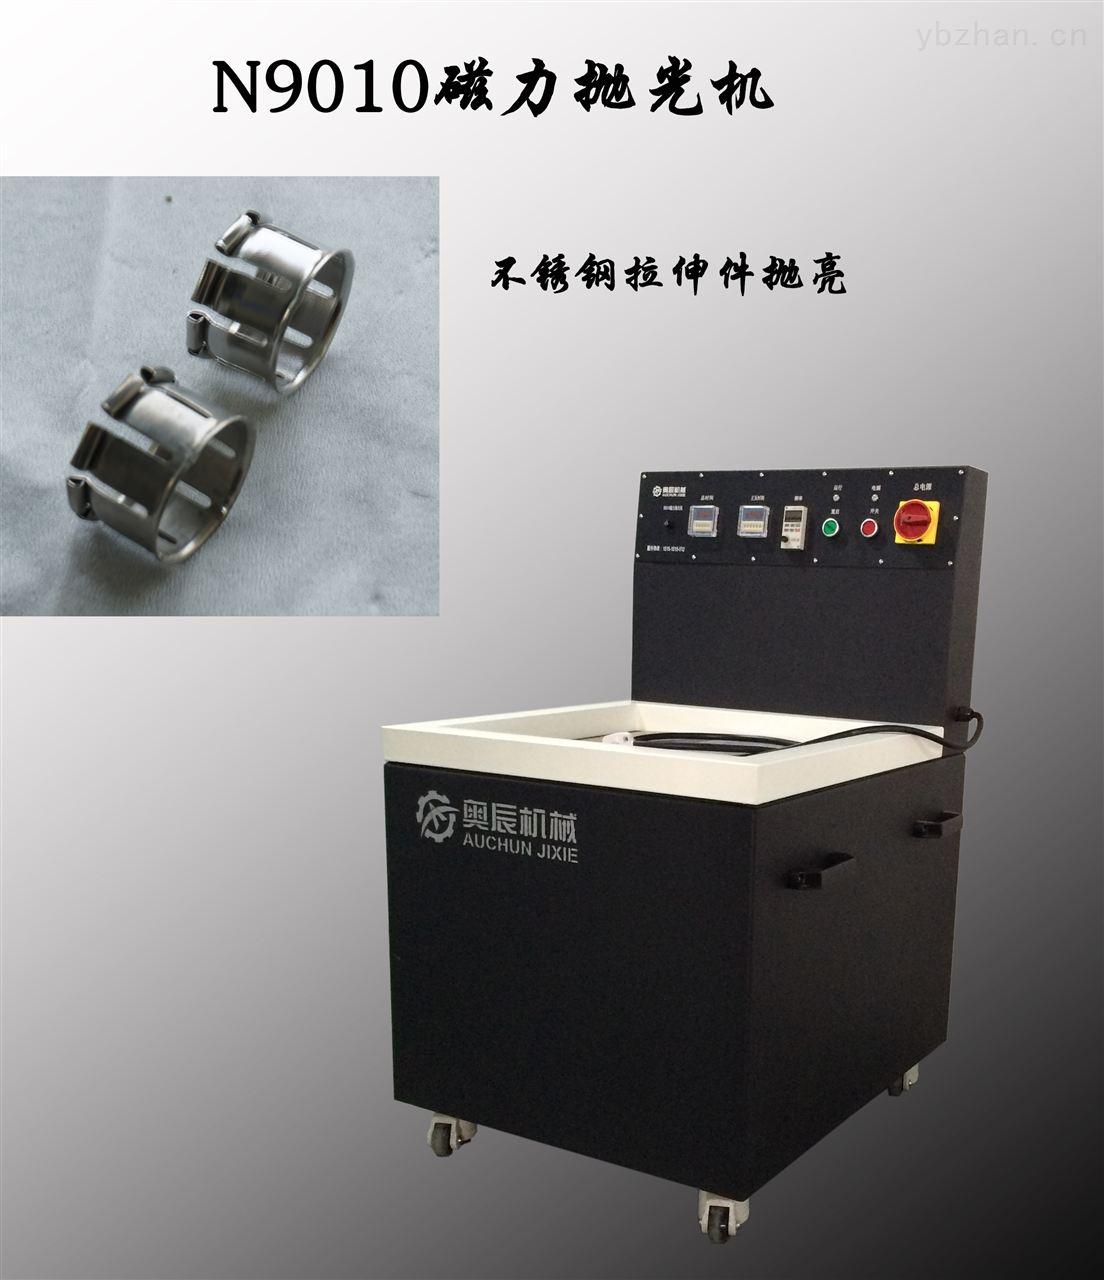 N8010-磁力抛光机不锈钢轴承抛光机